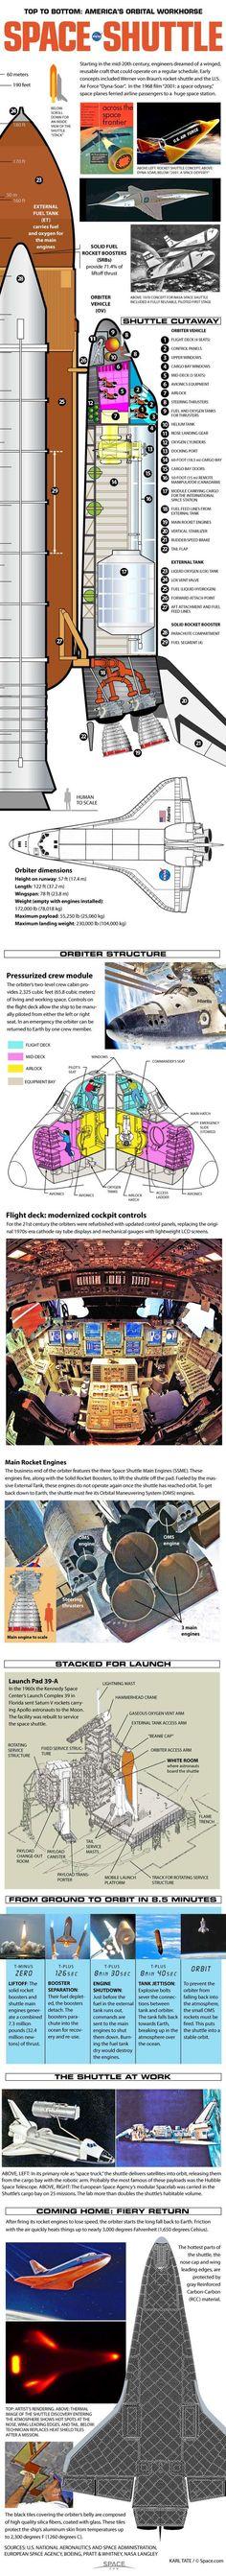 Así era un transbordador espacial